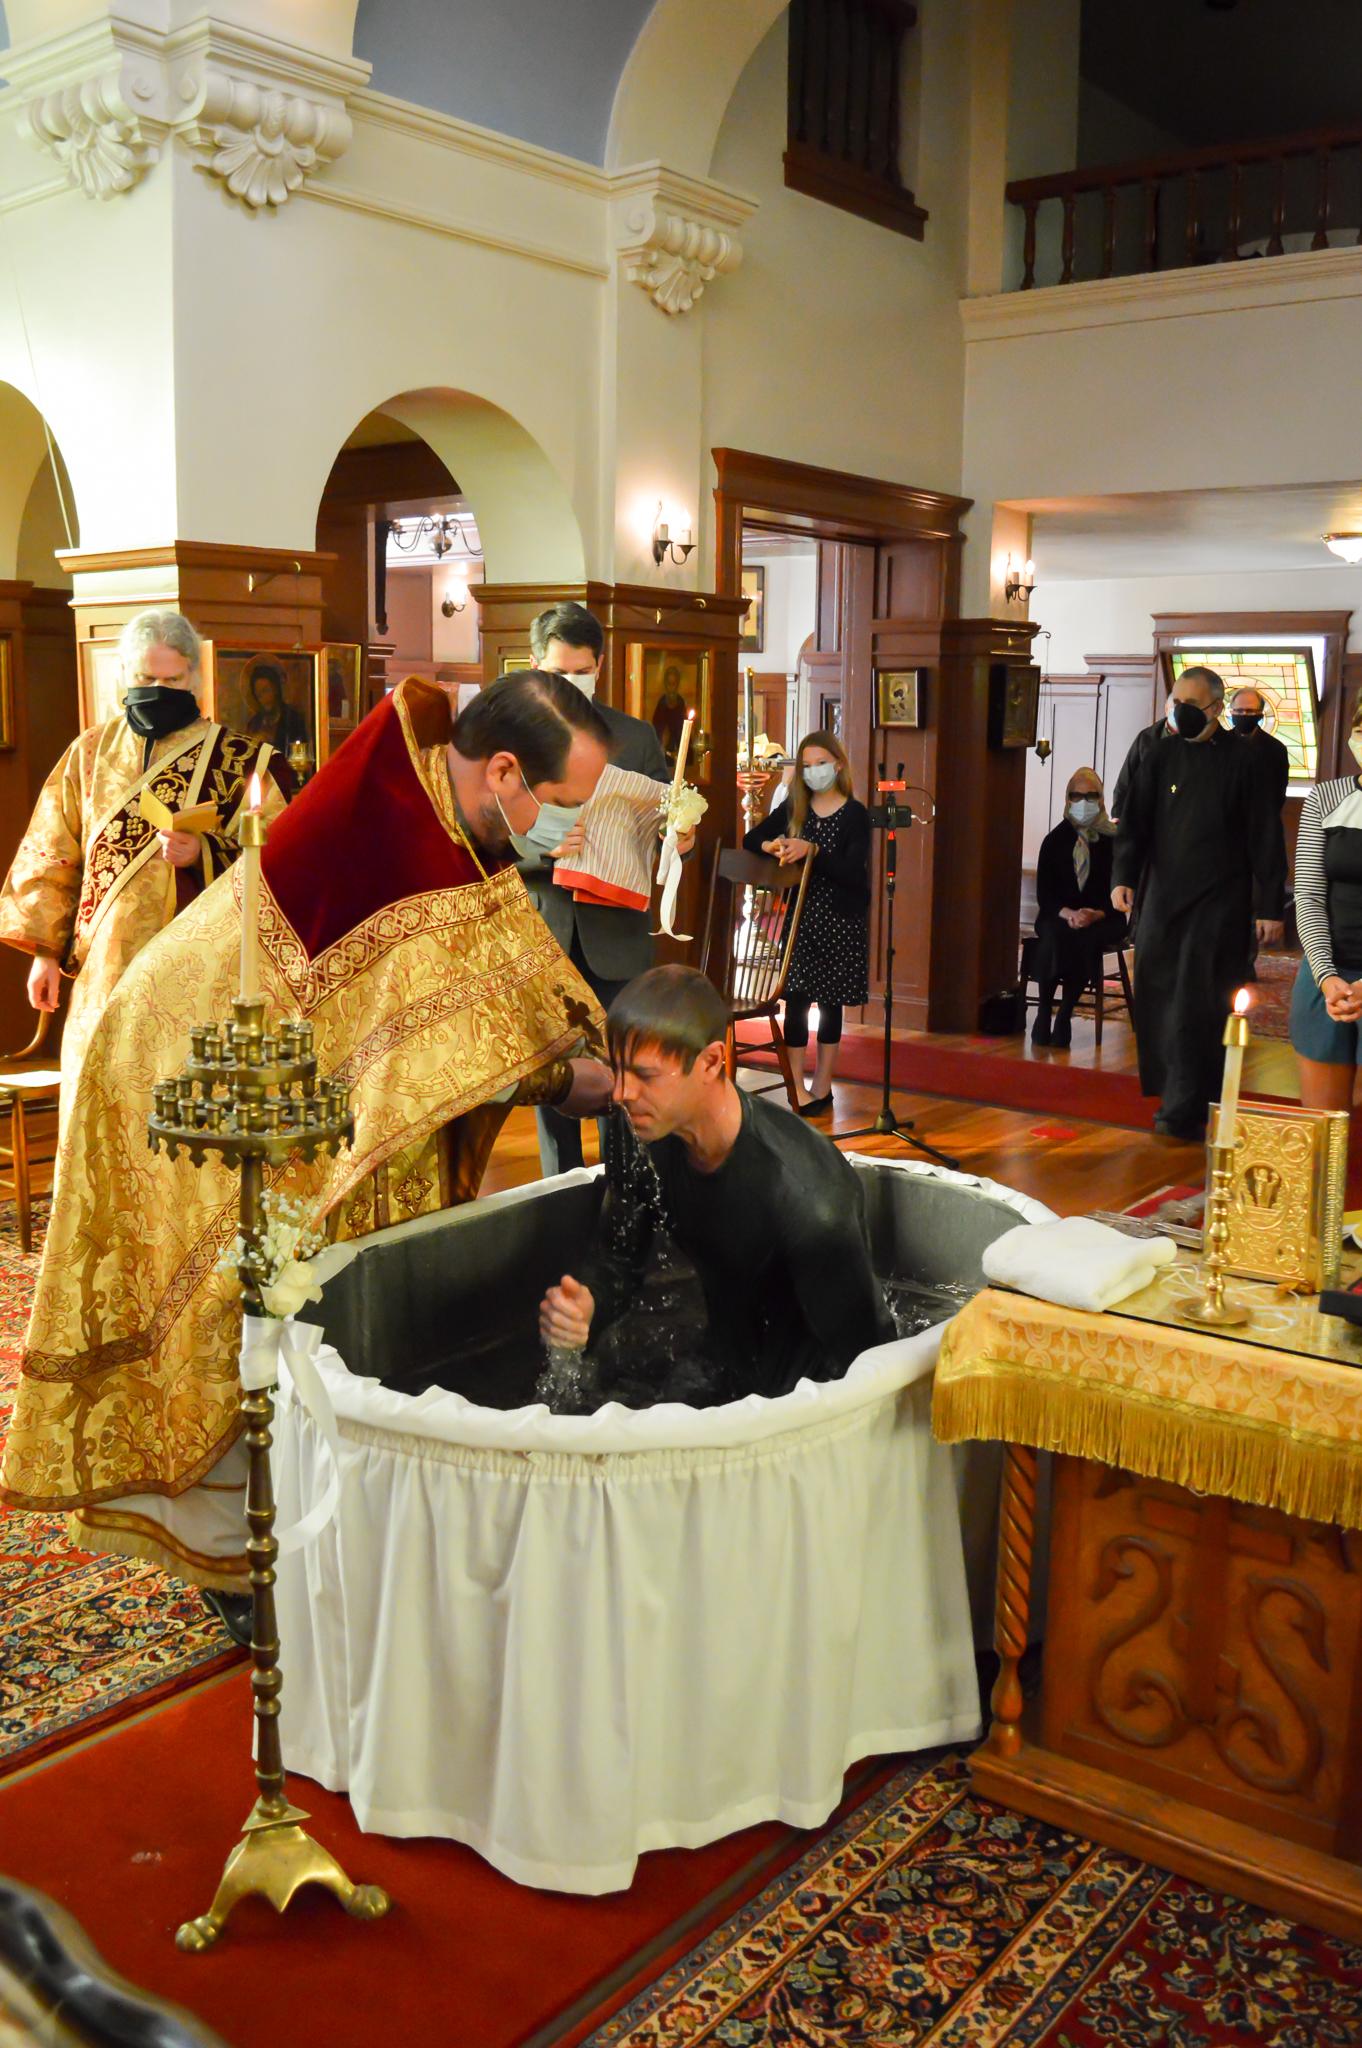 John-and-Alexandra-Baptism-Feb28-26